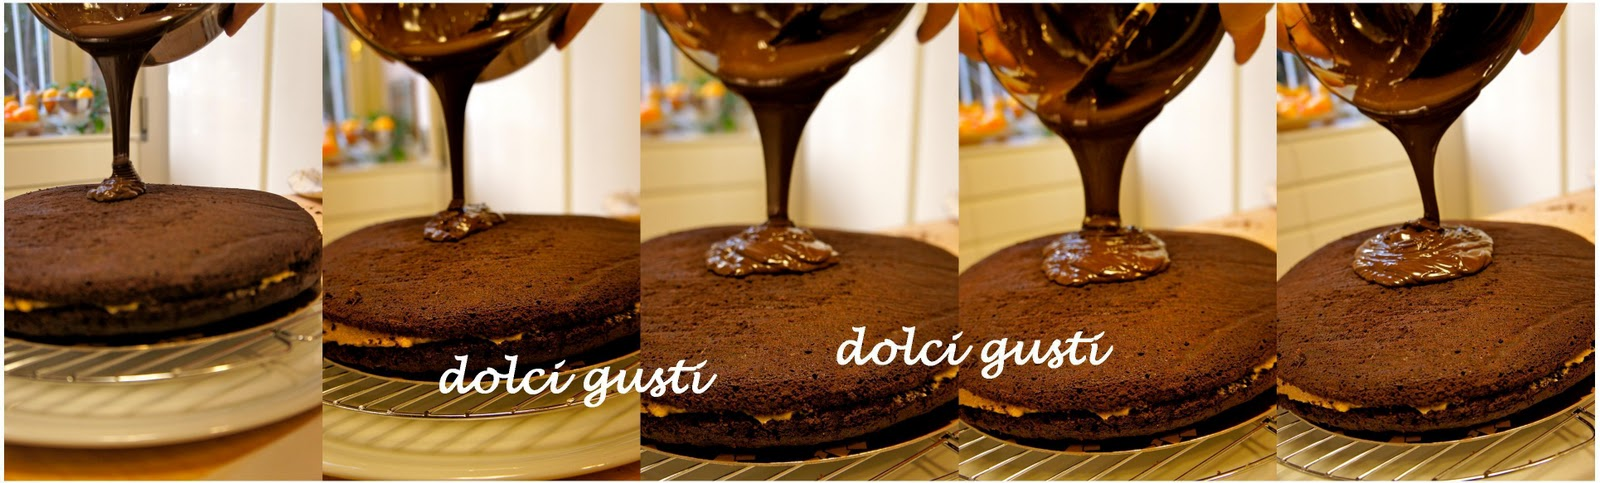 Divine Cakes And Desserts Riccarton